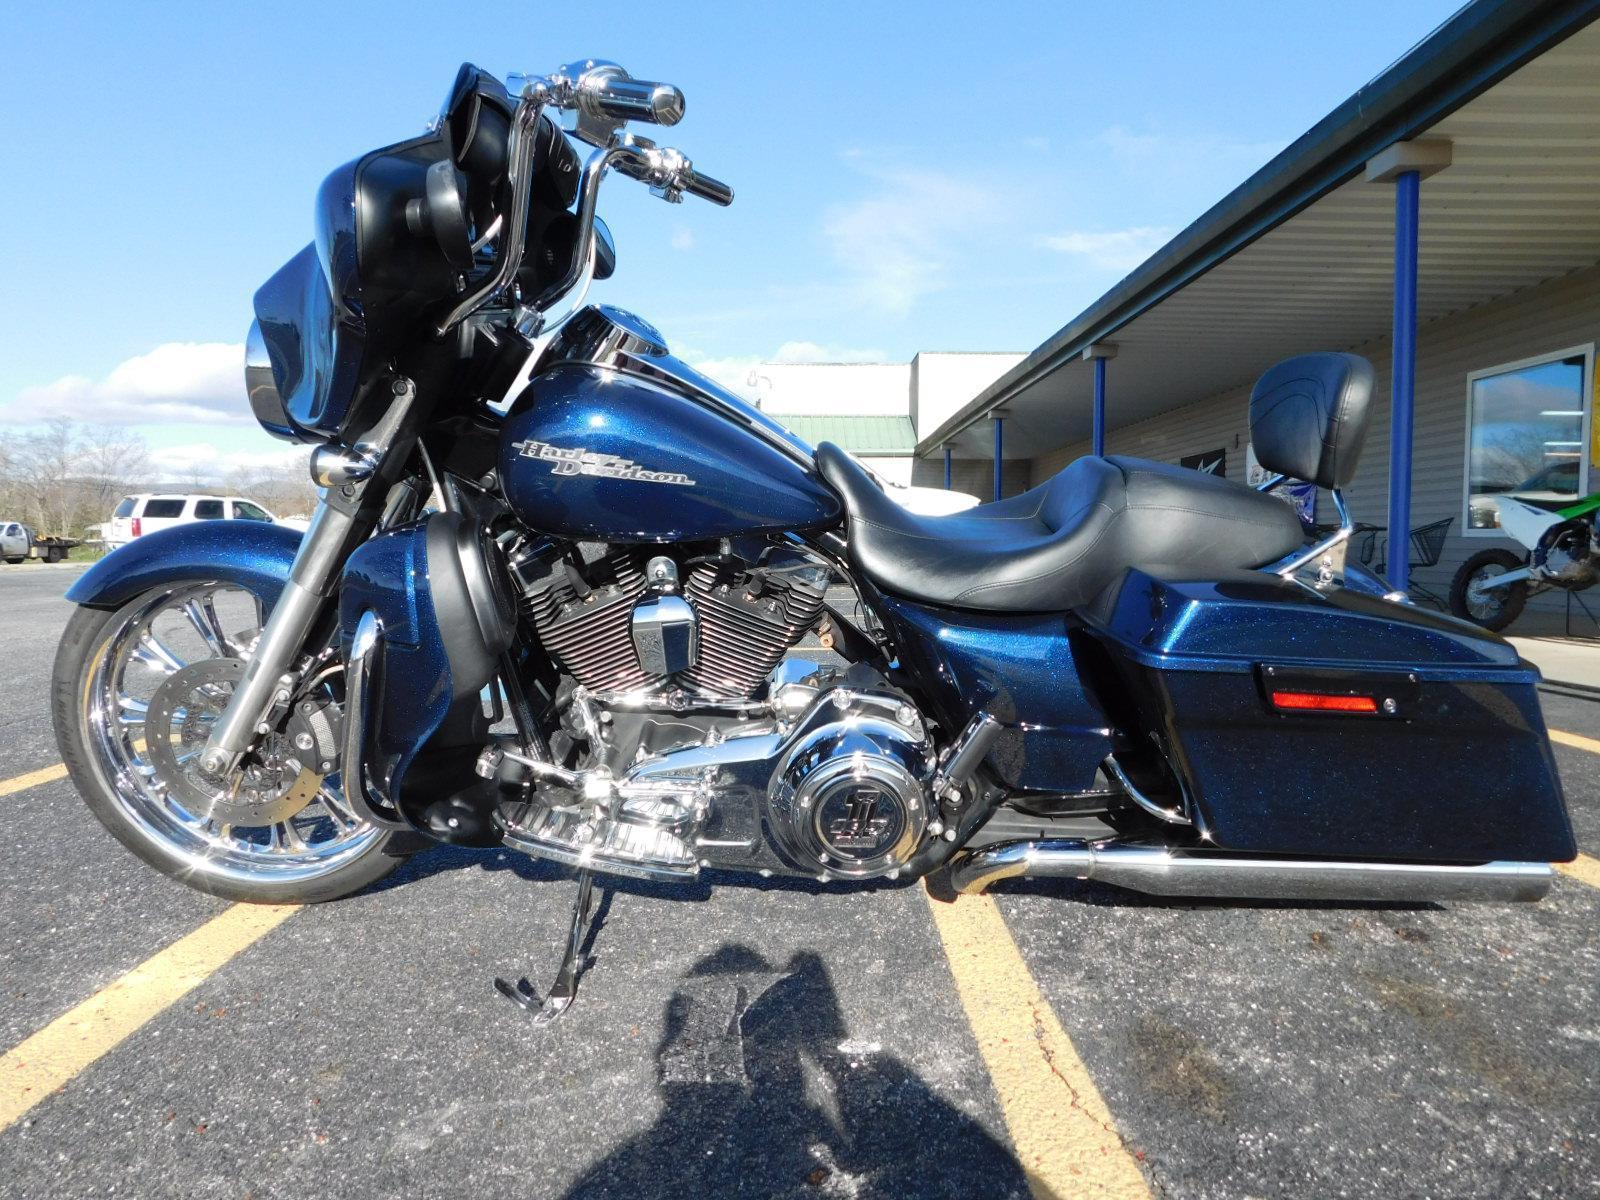 2012 Harley Davidson FLHX Street Glide Custom Color for sale in